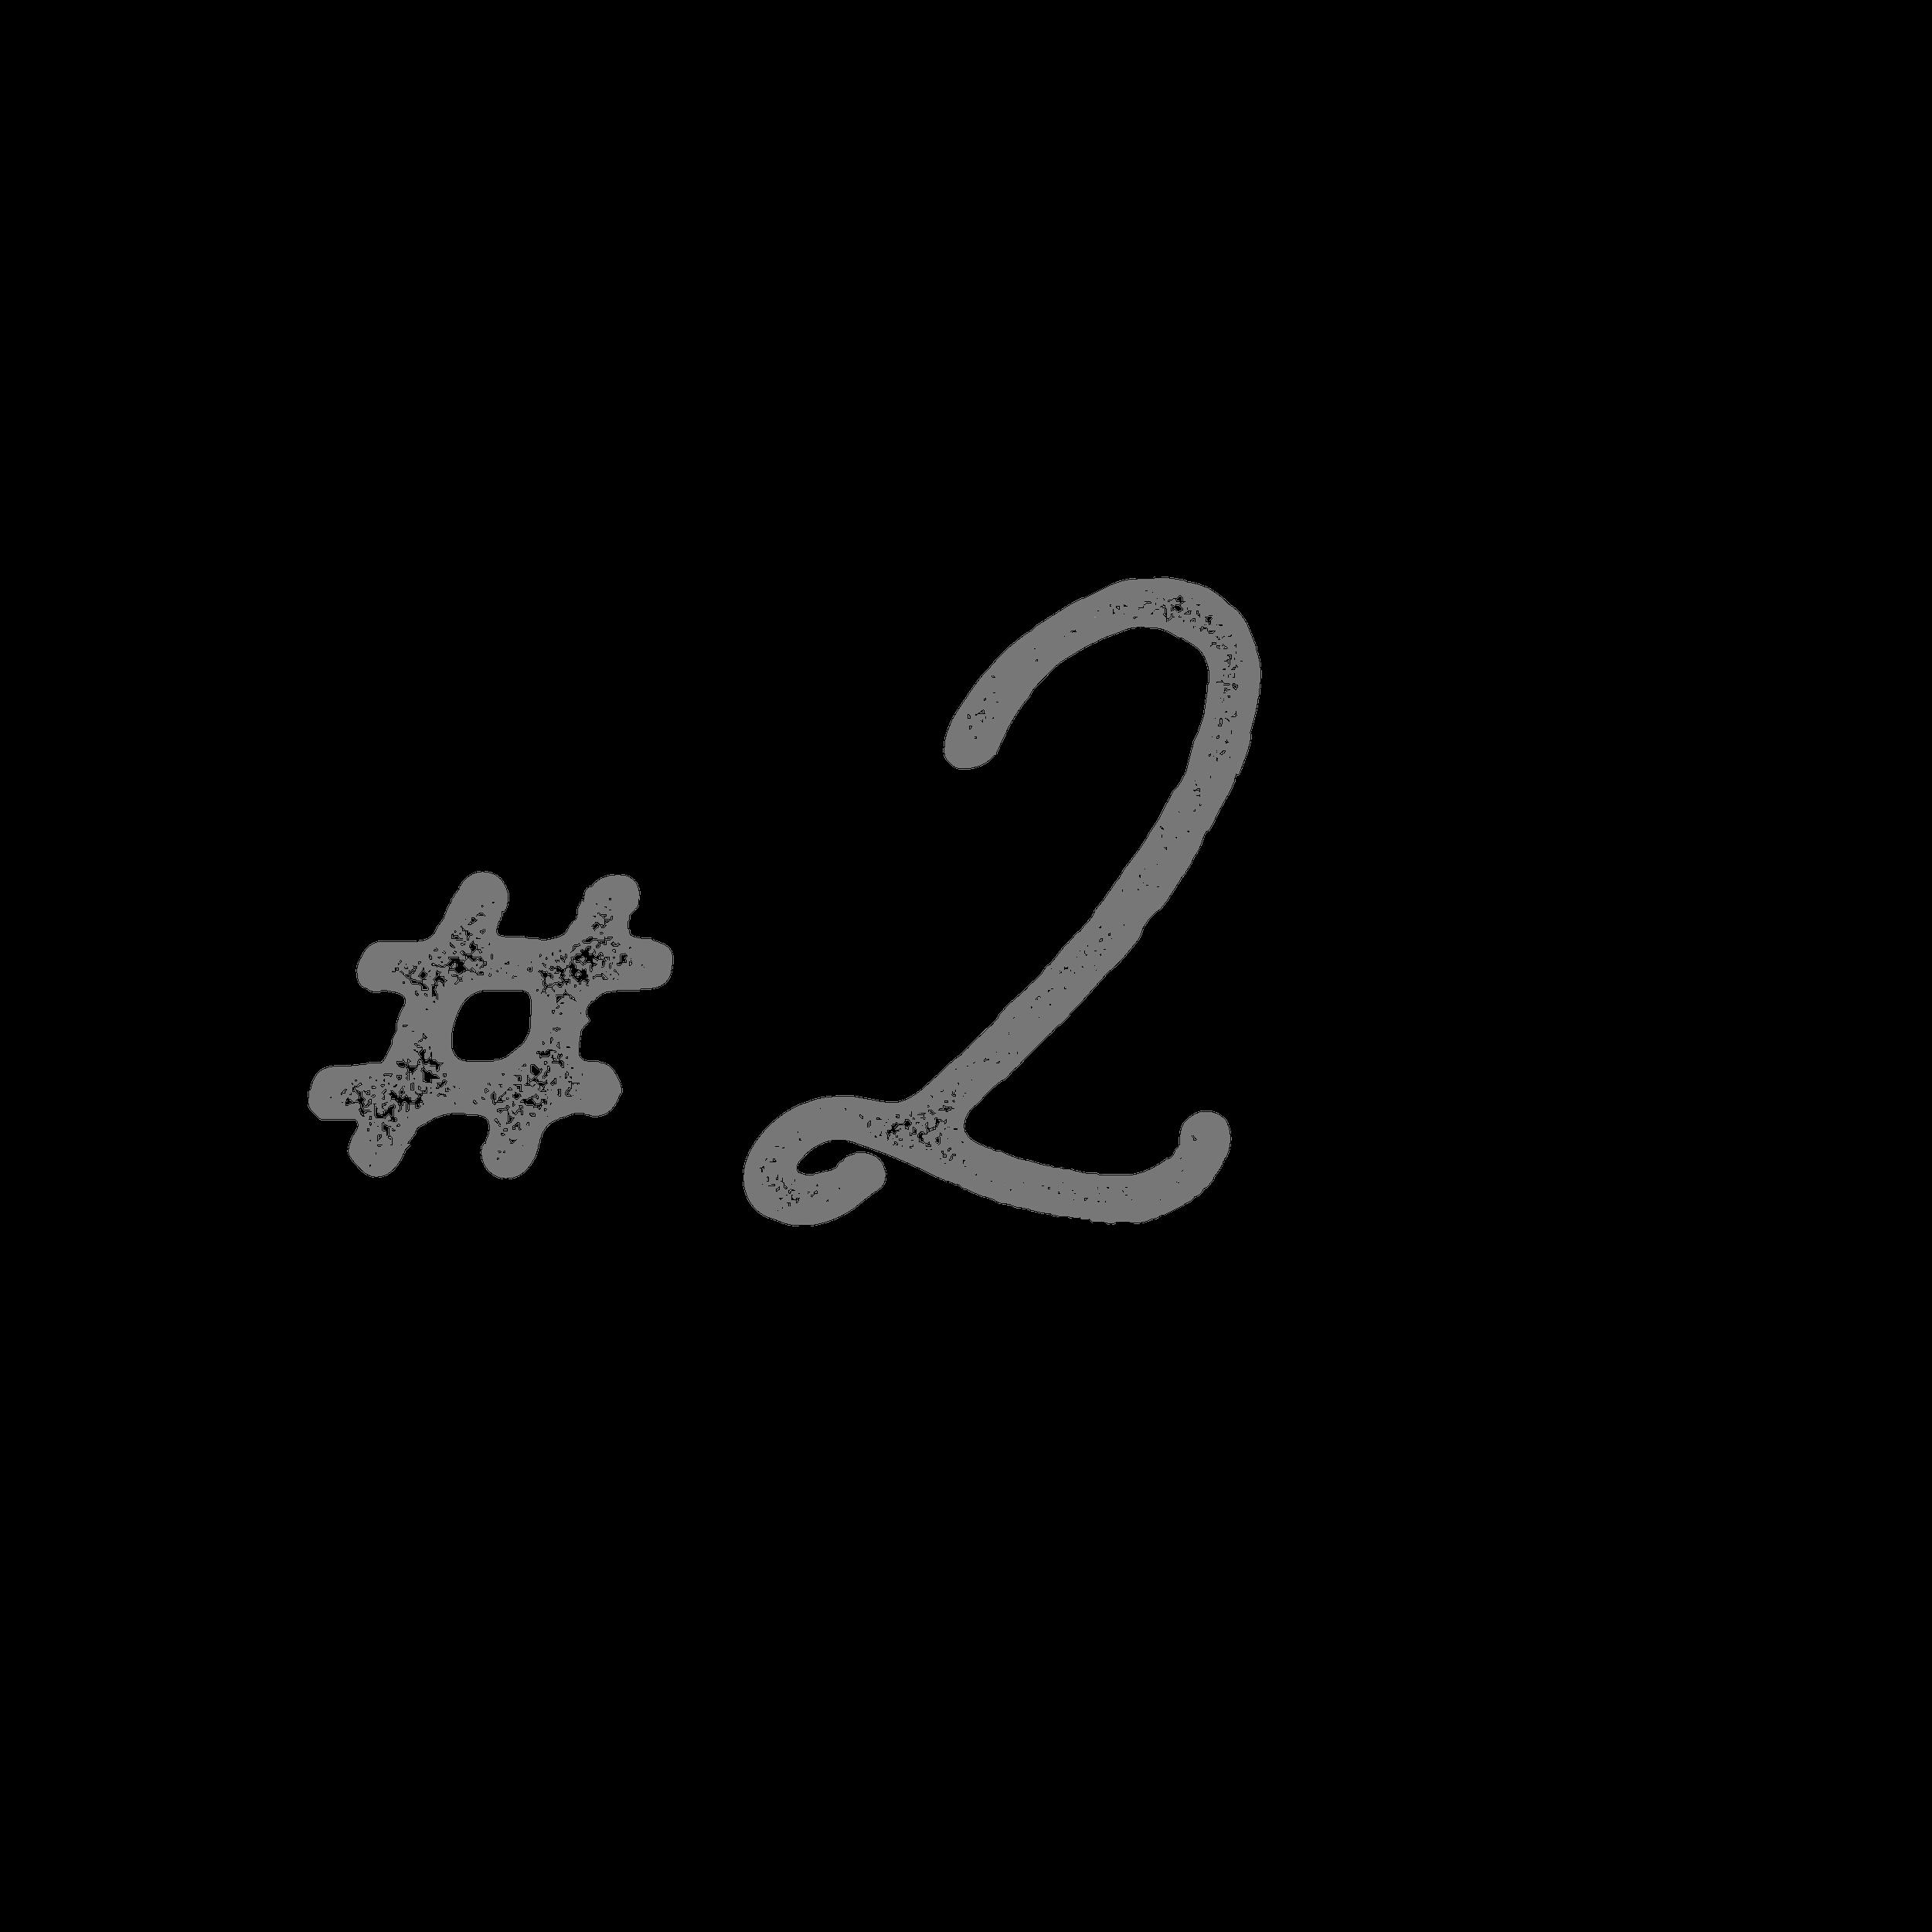 Hangover Branding Ideas-26.png